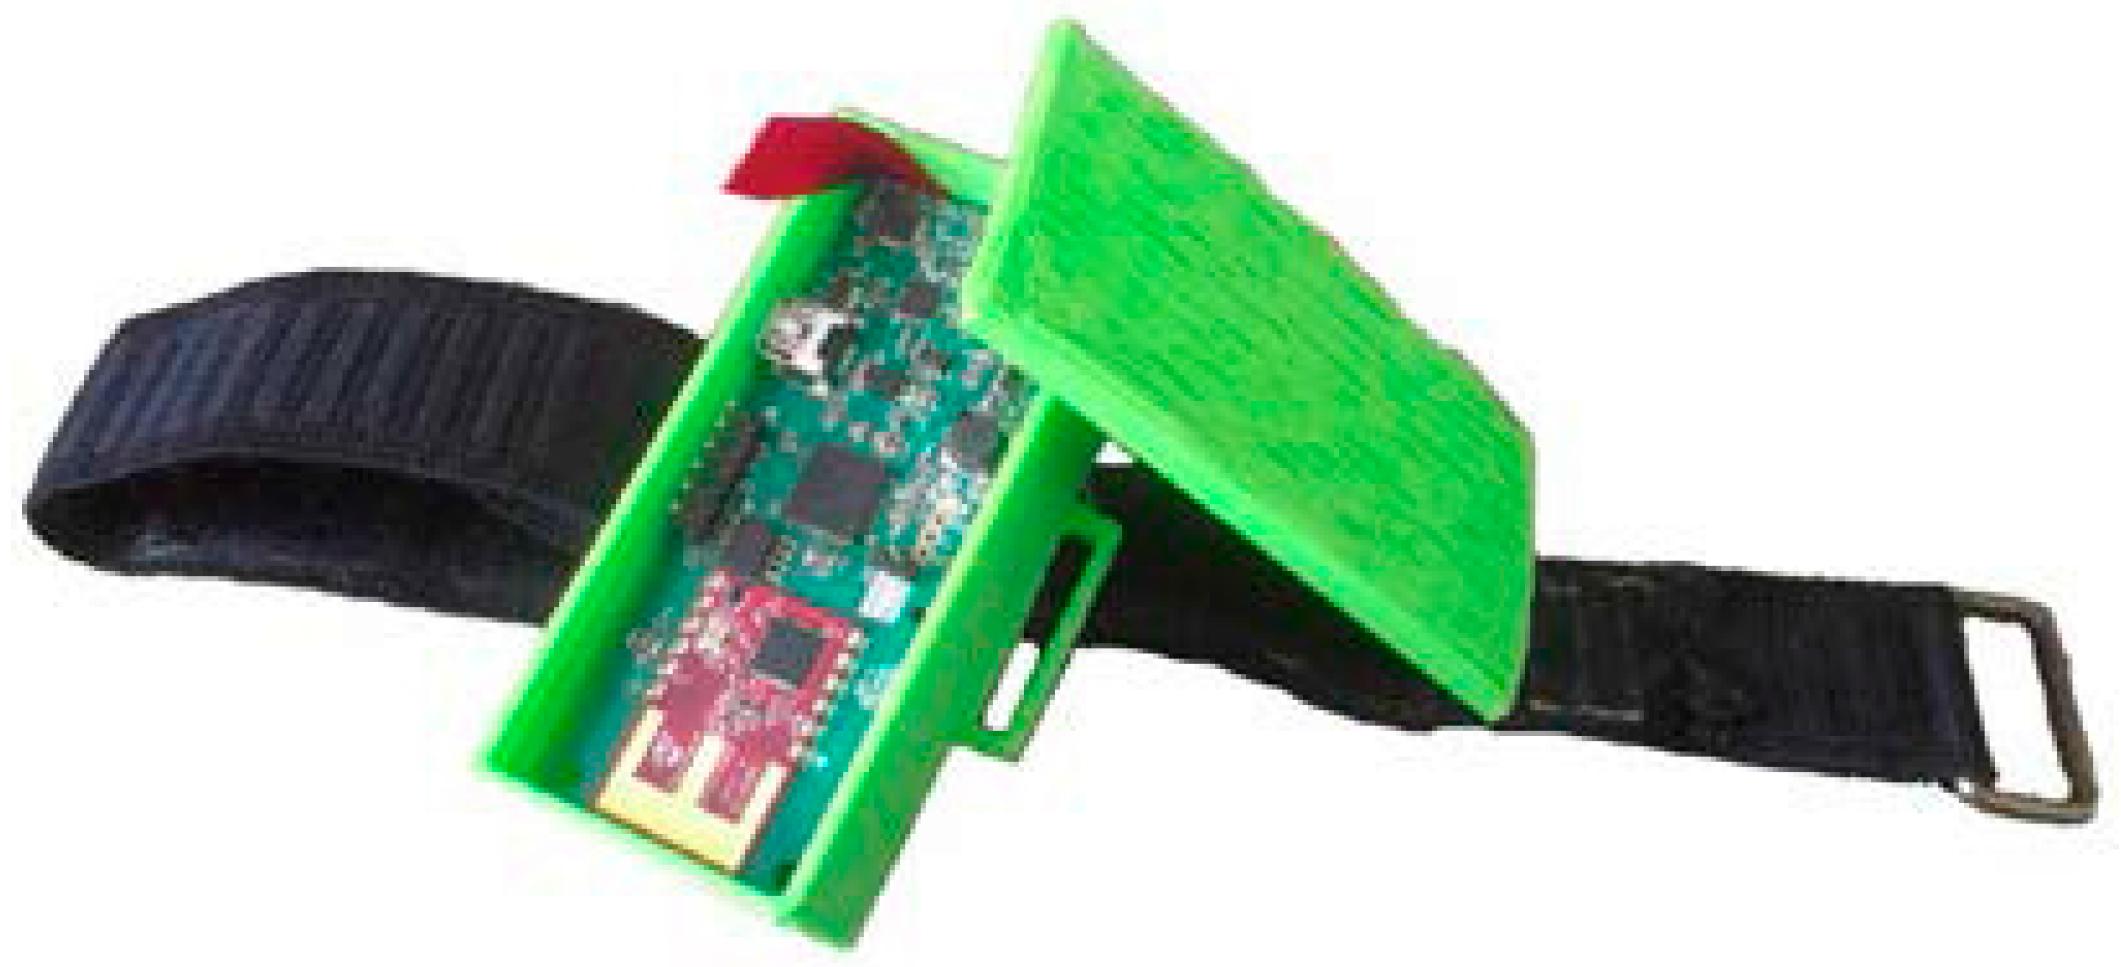 Sensors   Free Full-Text   Quaternion-Based Gesture ...